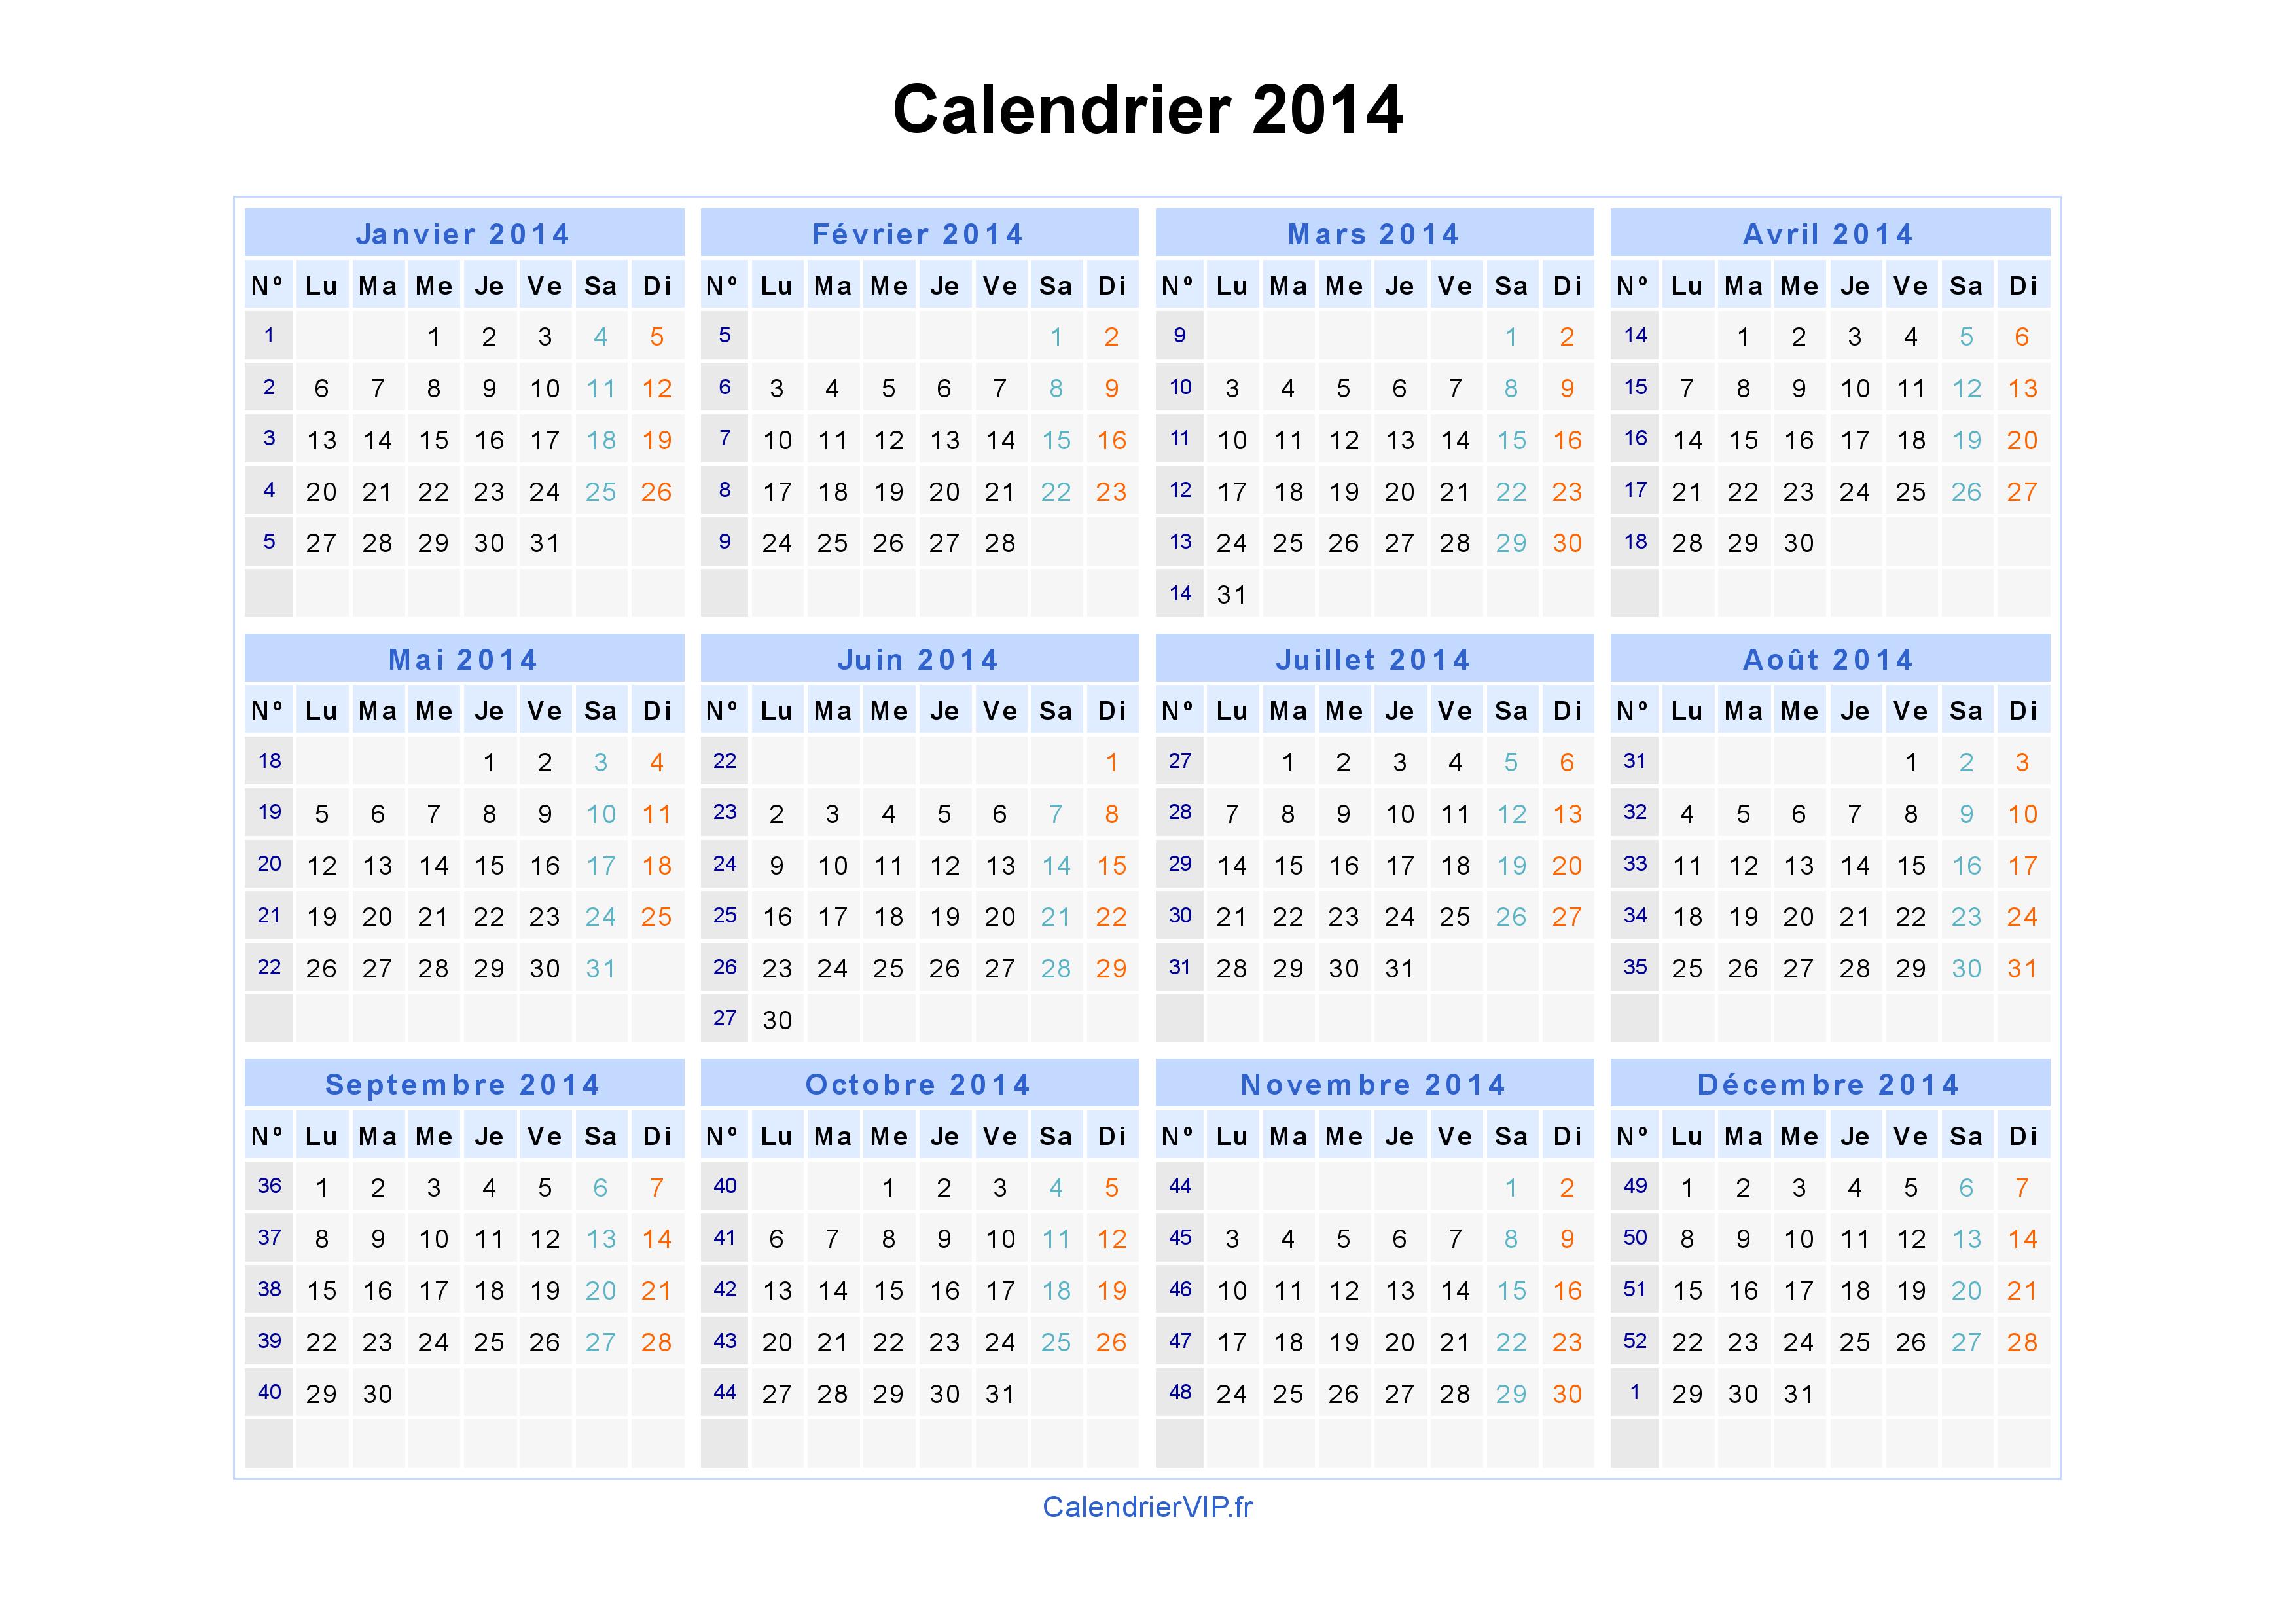 calendrier 2015 gratuit imprimer pdf a3 new calendar. Black Bedroom Furniture Sets. Home Design Ideas